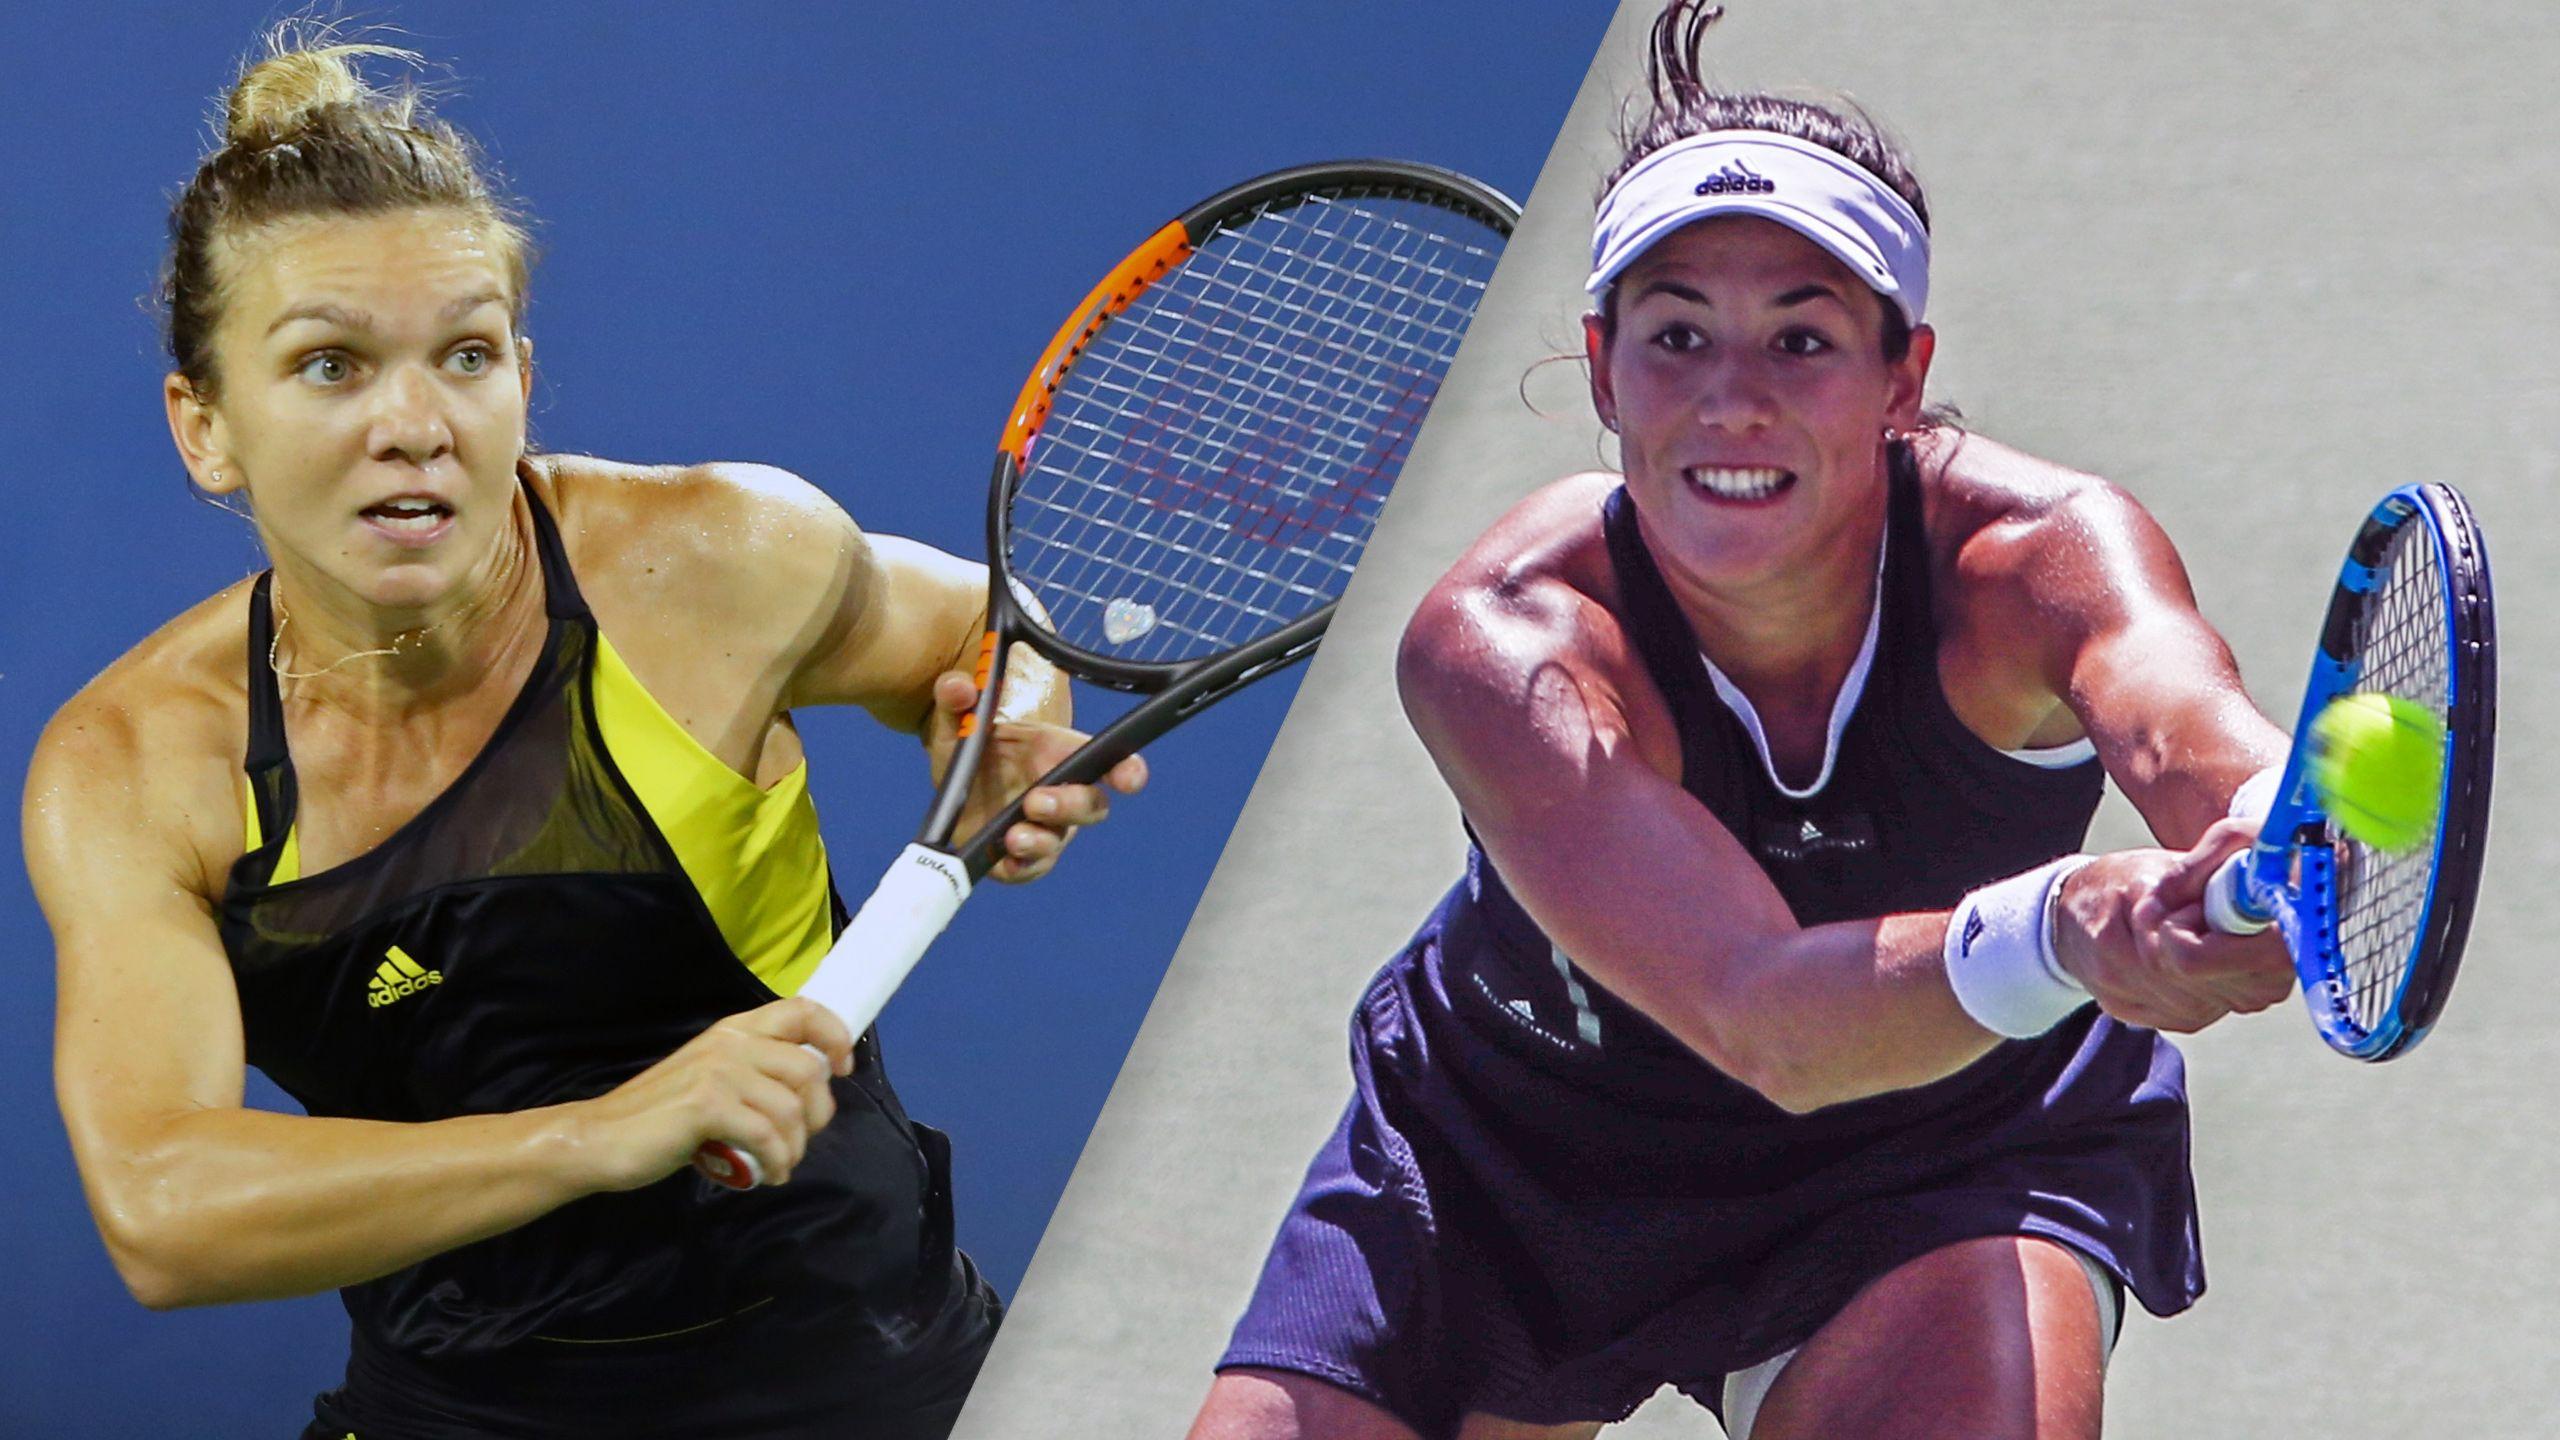 Simona Halep vs. Garbine Muguruza (Women's Championship)